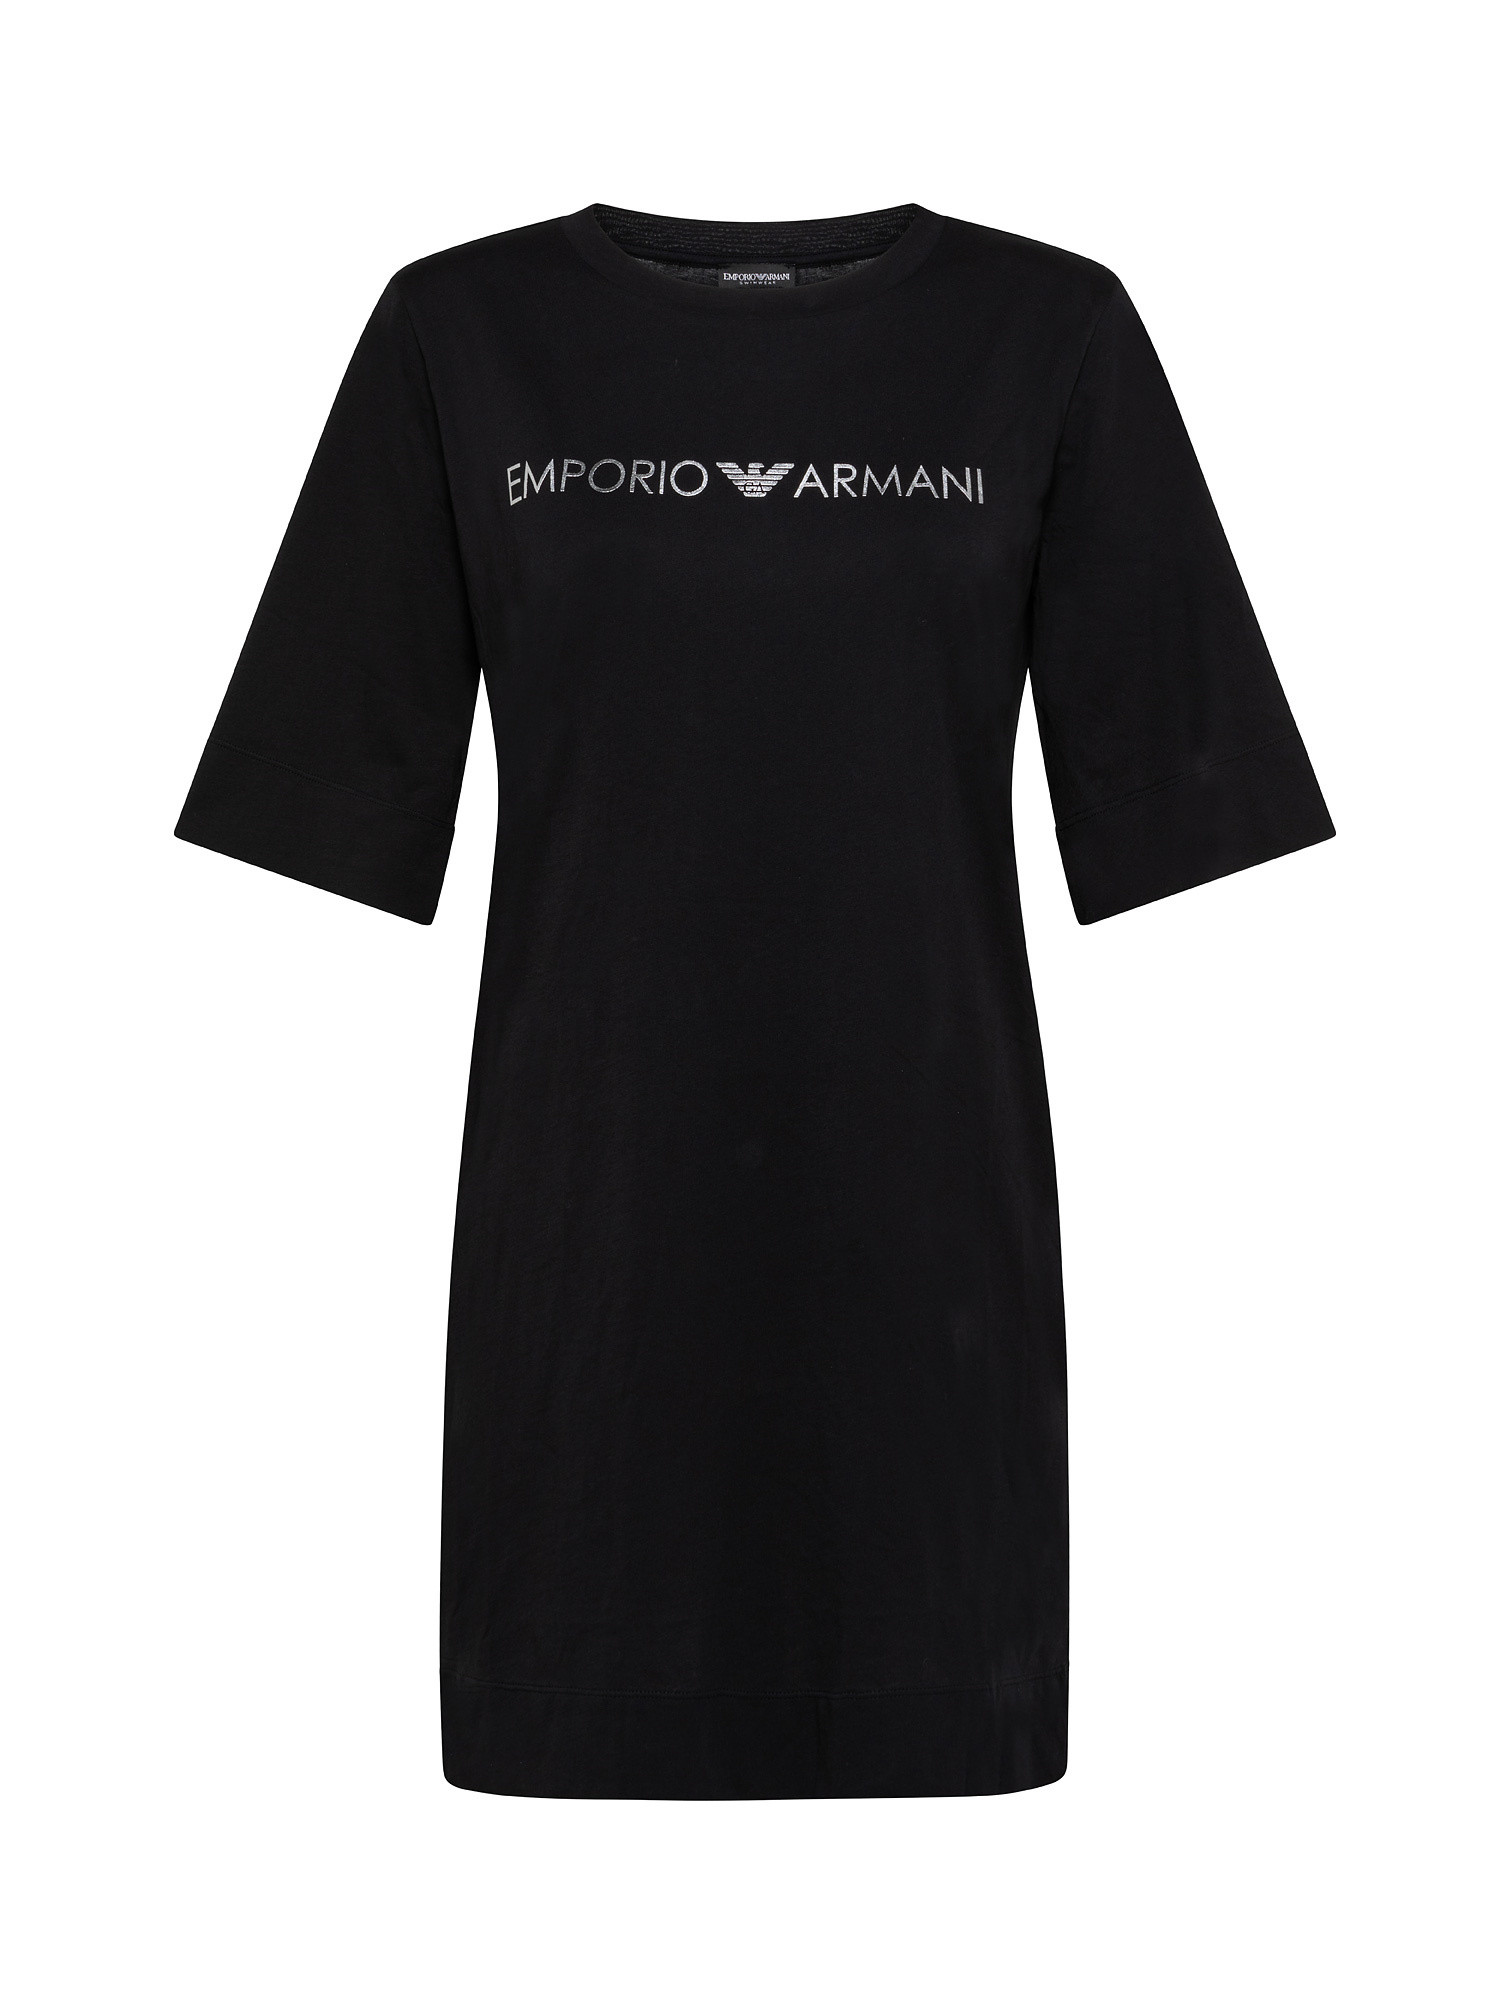 Maxi T-Shirt copricostume, Nero, large image number 0